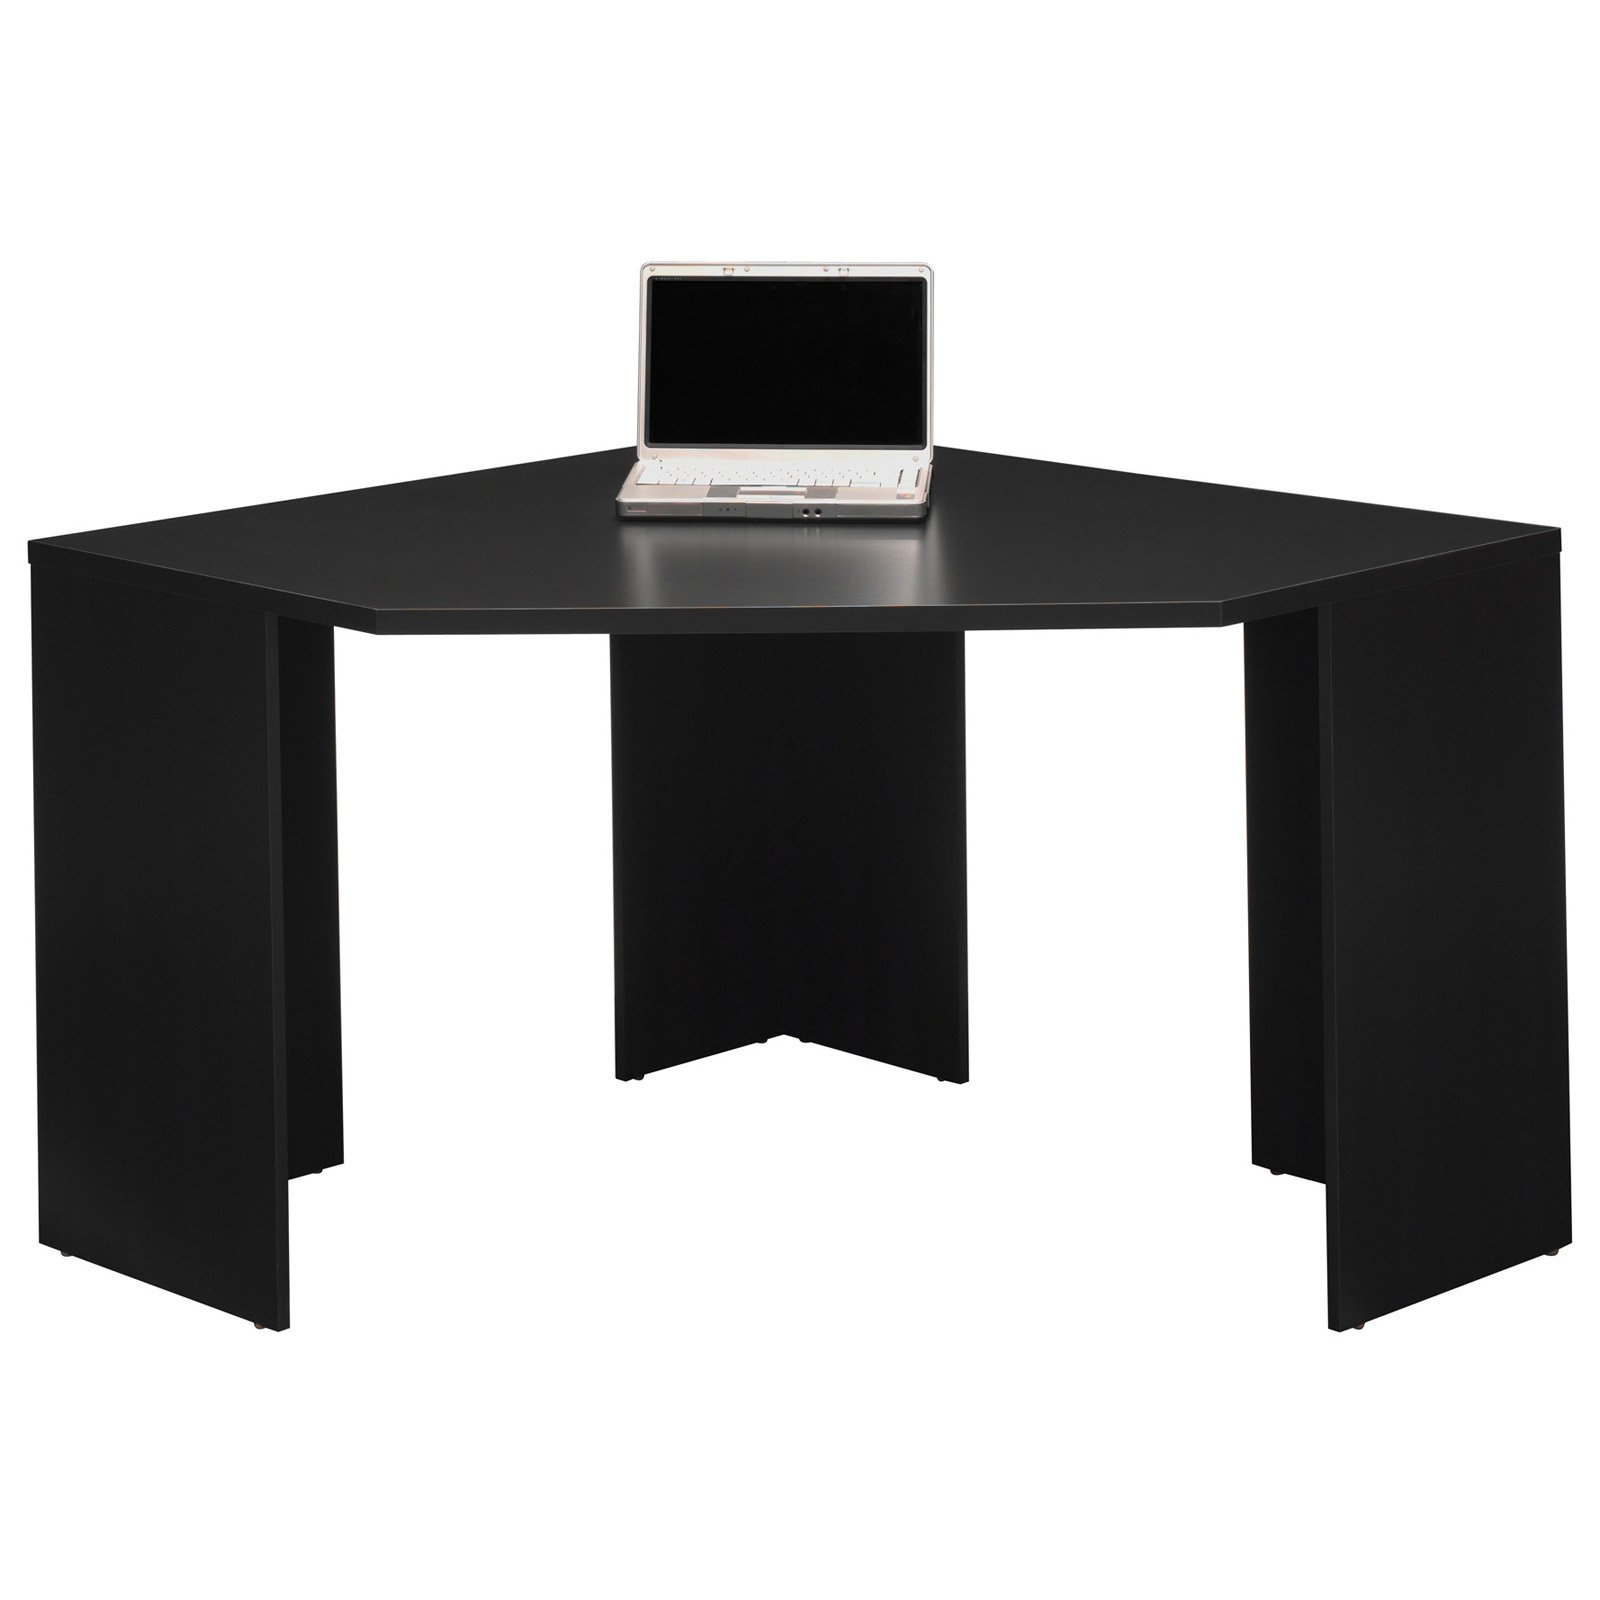 Bush My Space Stockport Corner Computer Desk With Optional